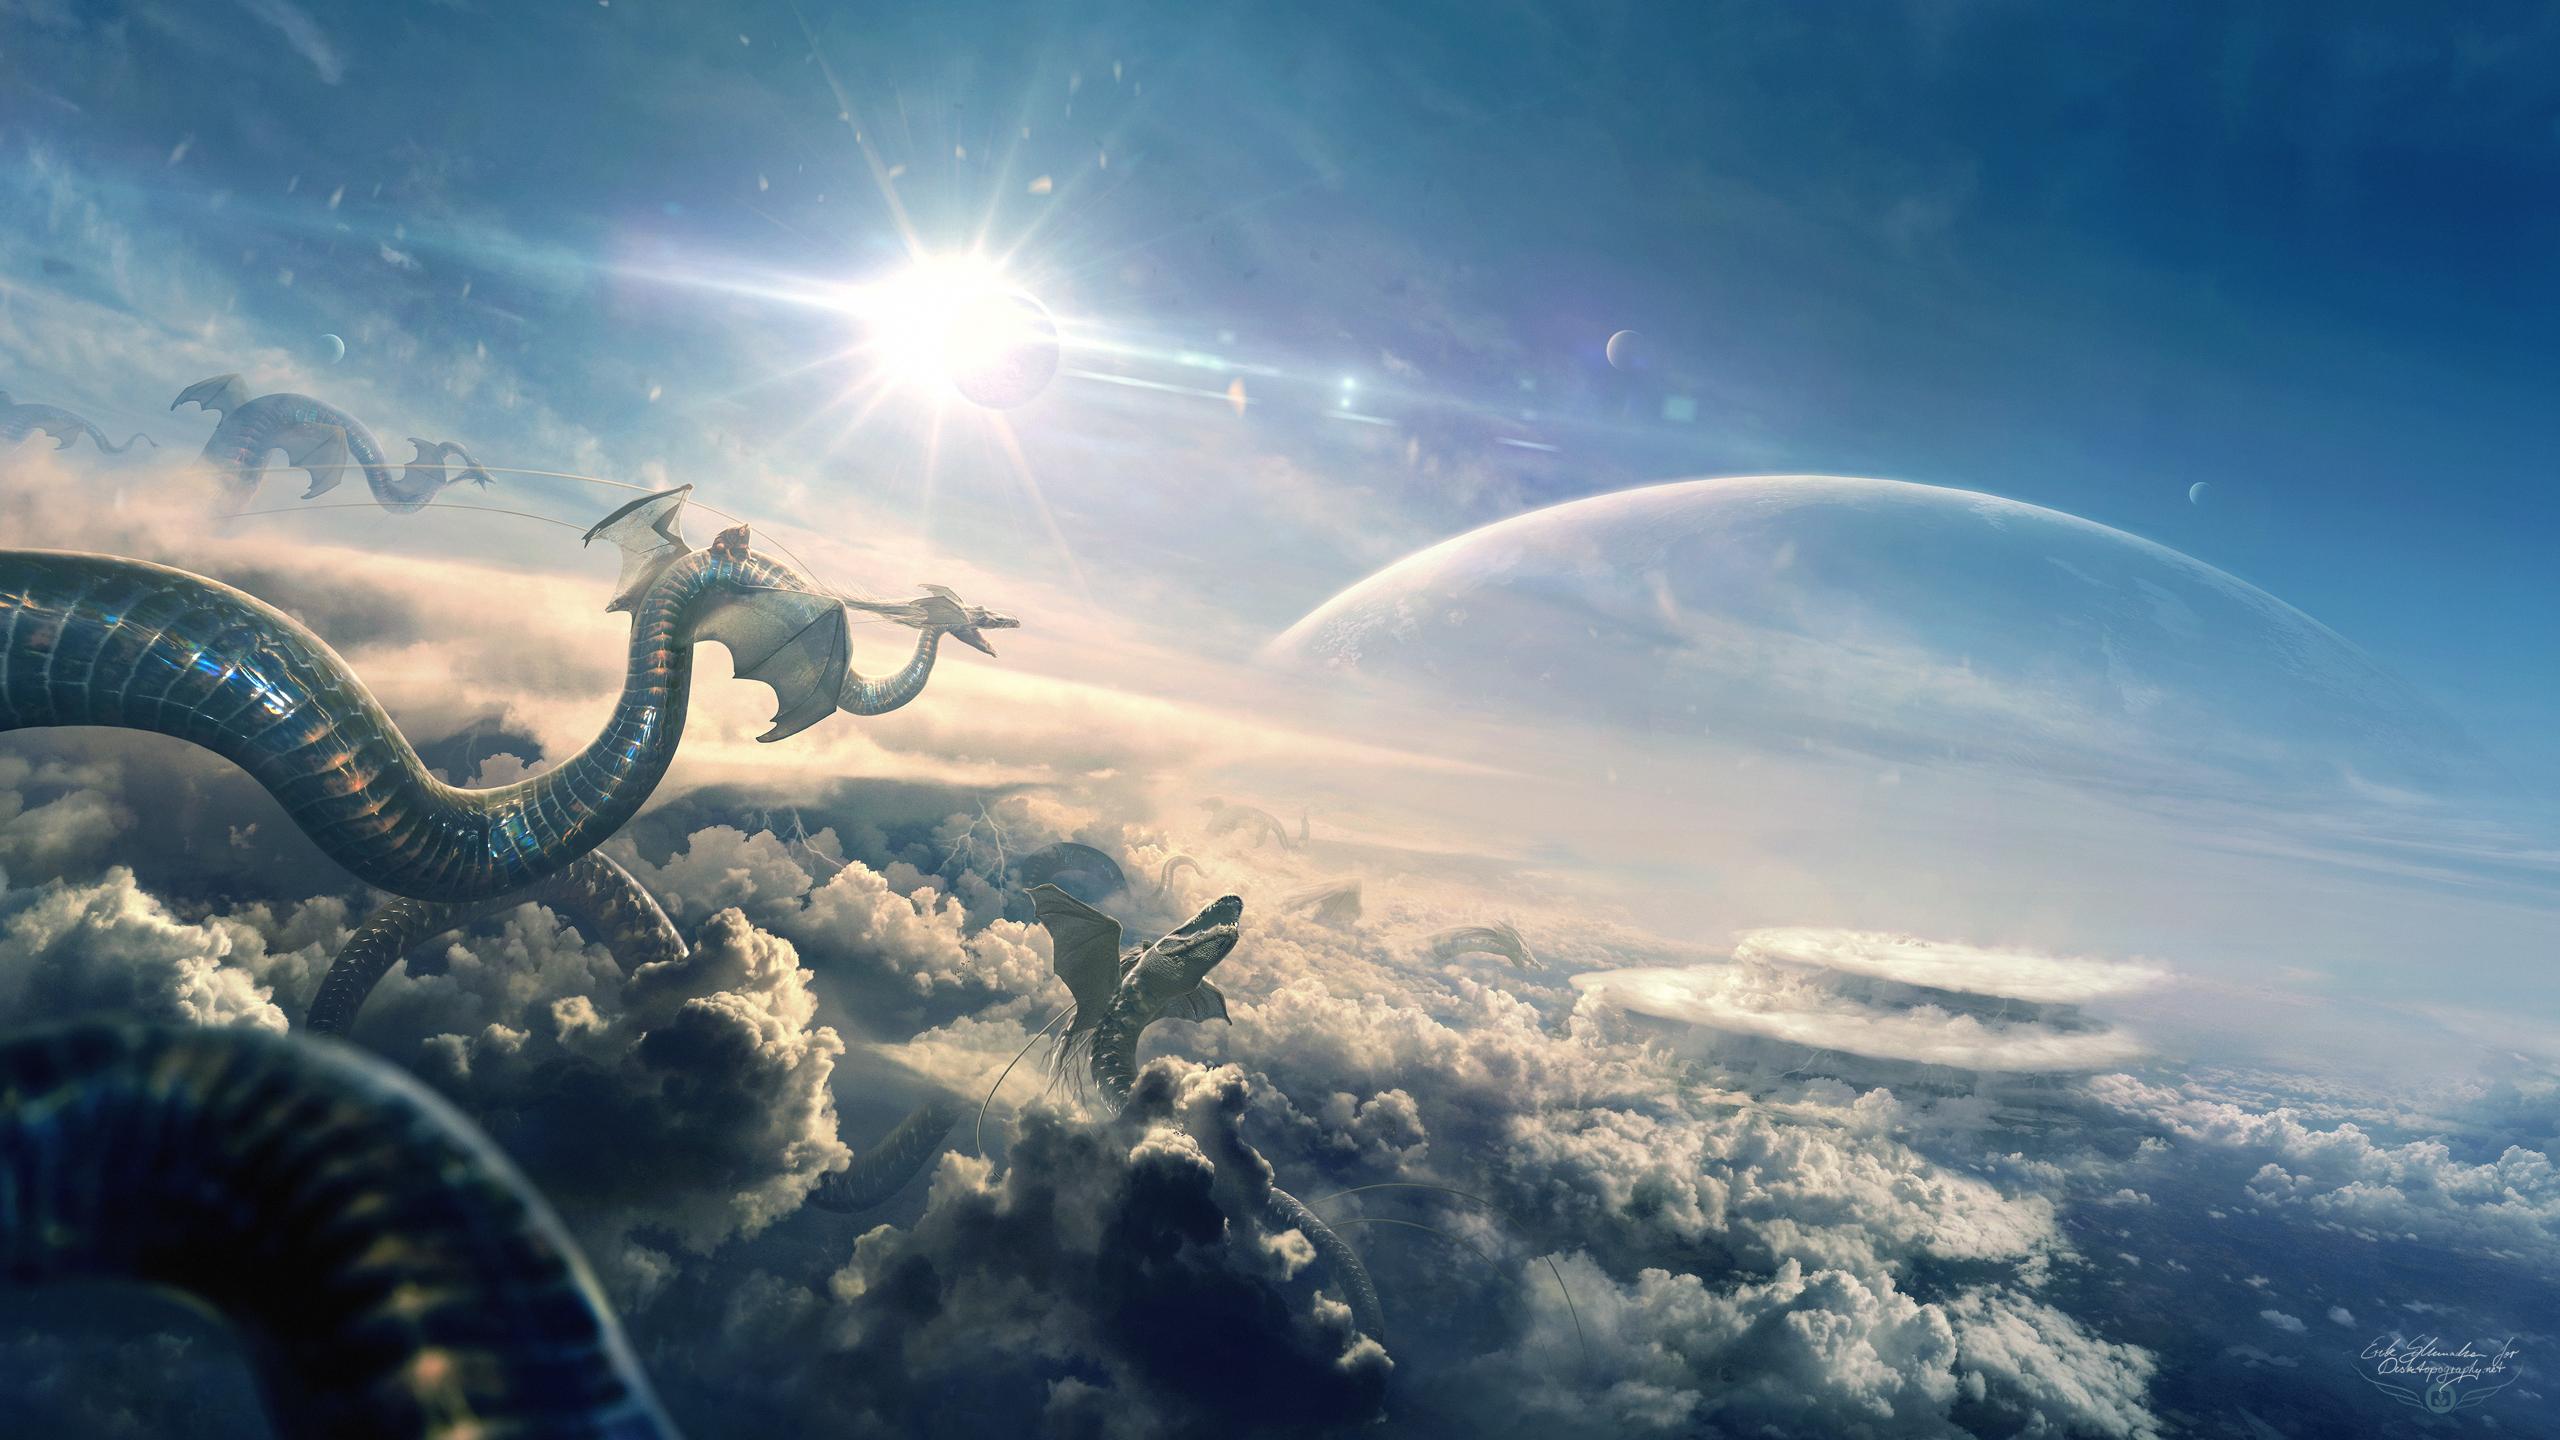 Dragon Flight Eclipse Hd Artist 4k Wallpapers Images